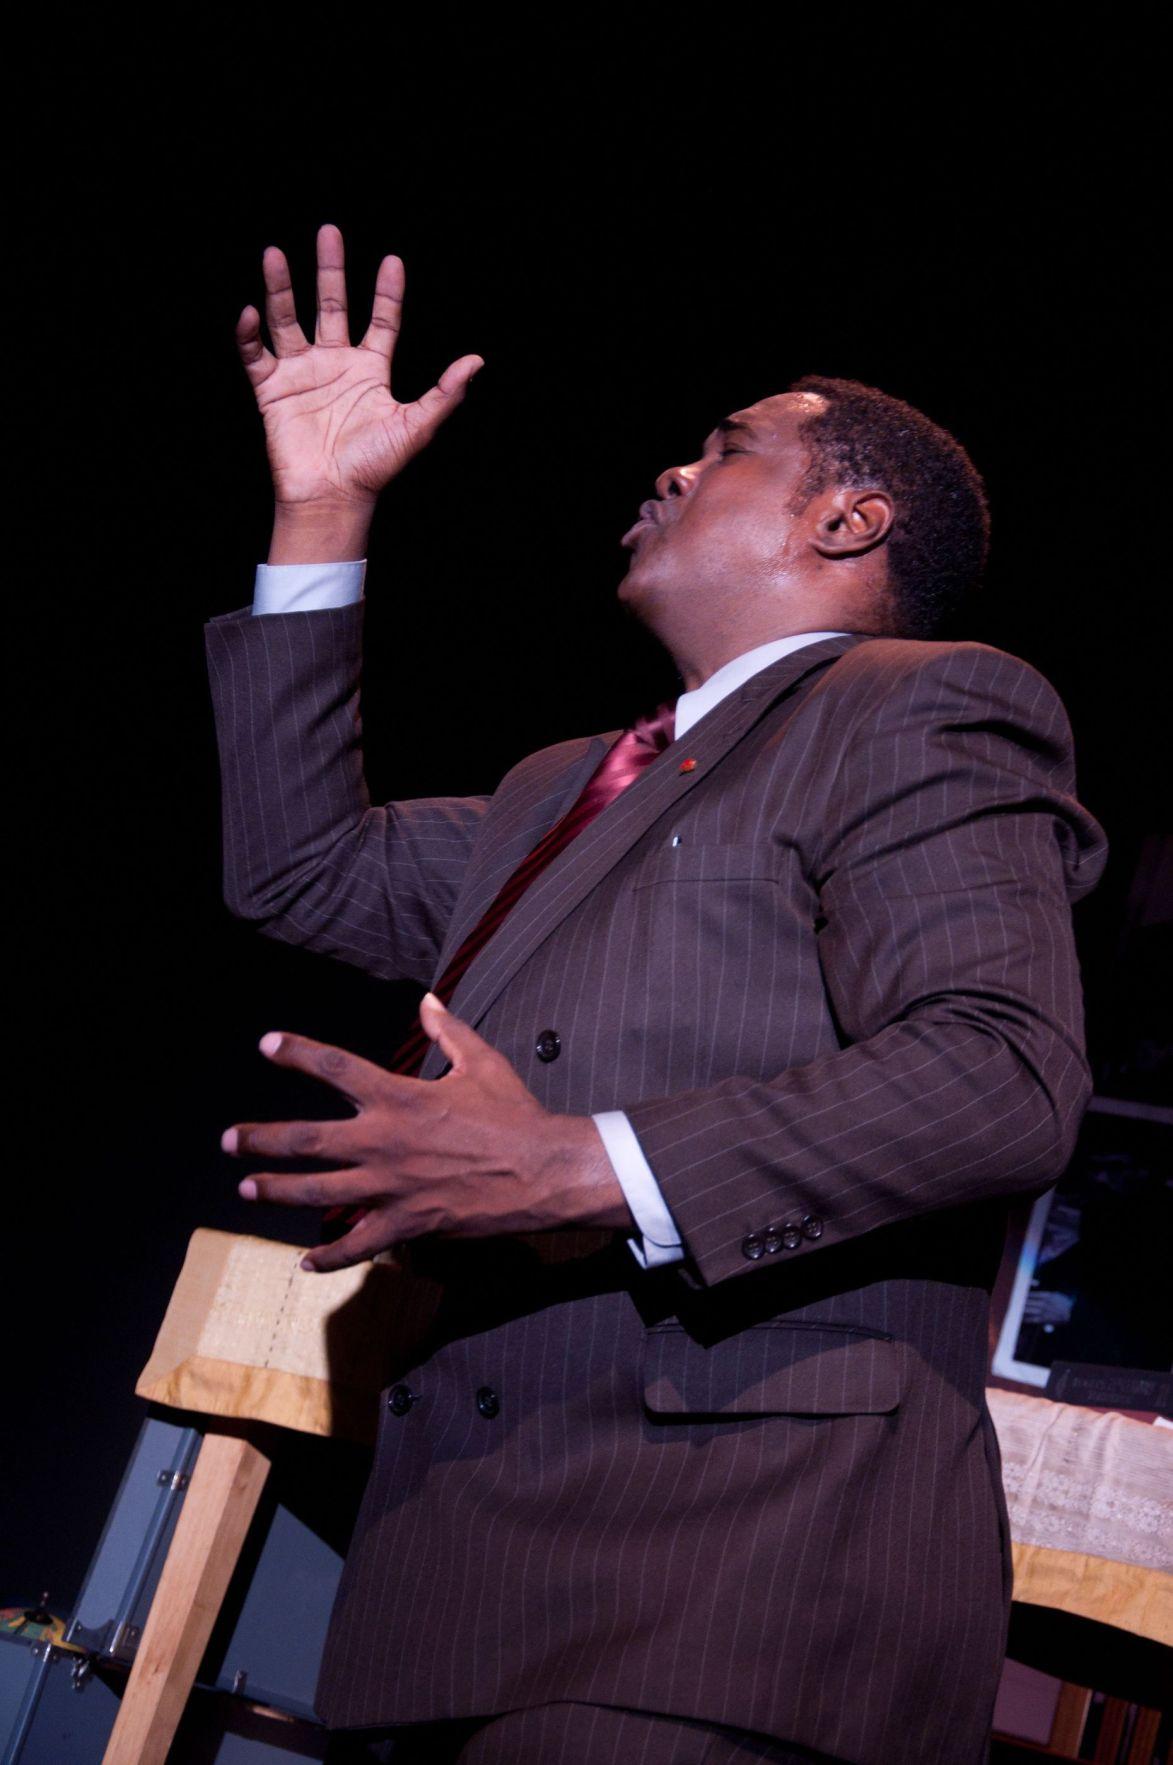 Opera singer's voice often compared to activist legend